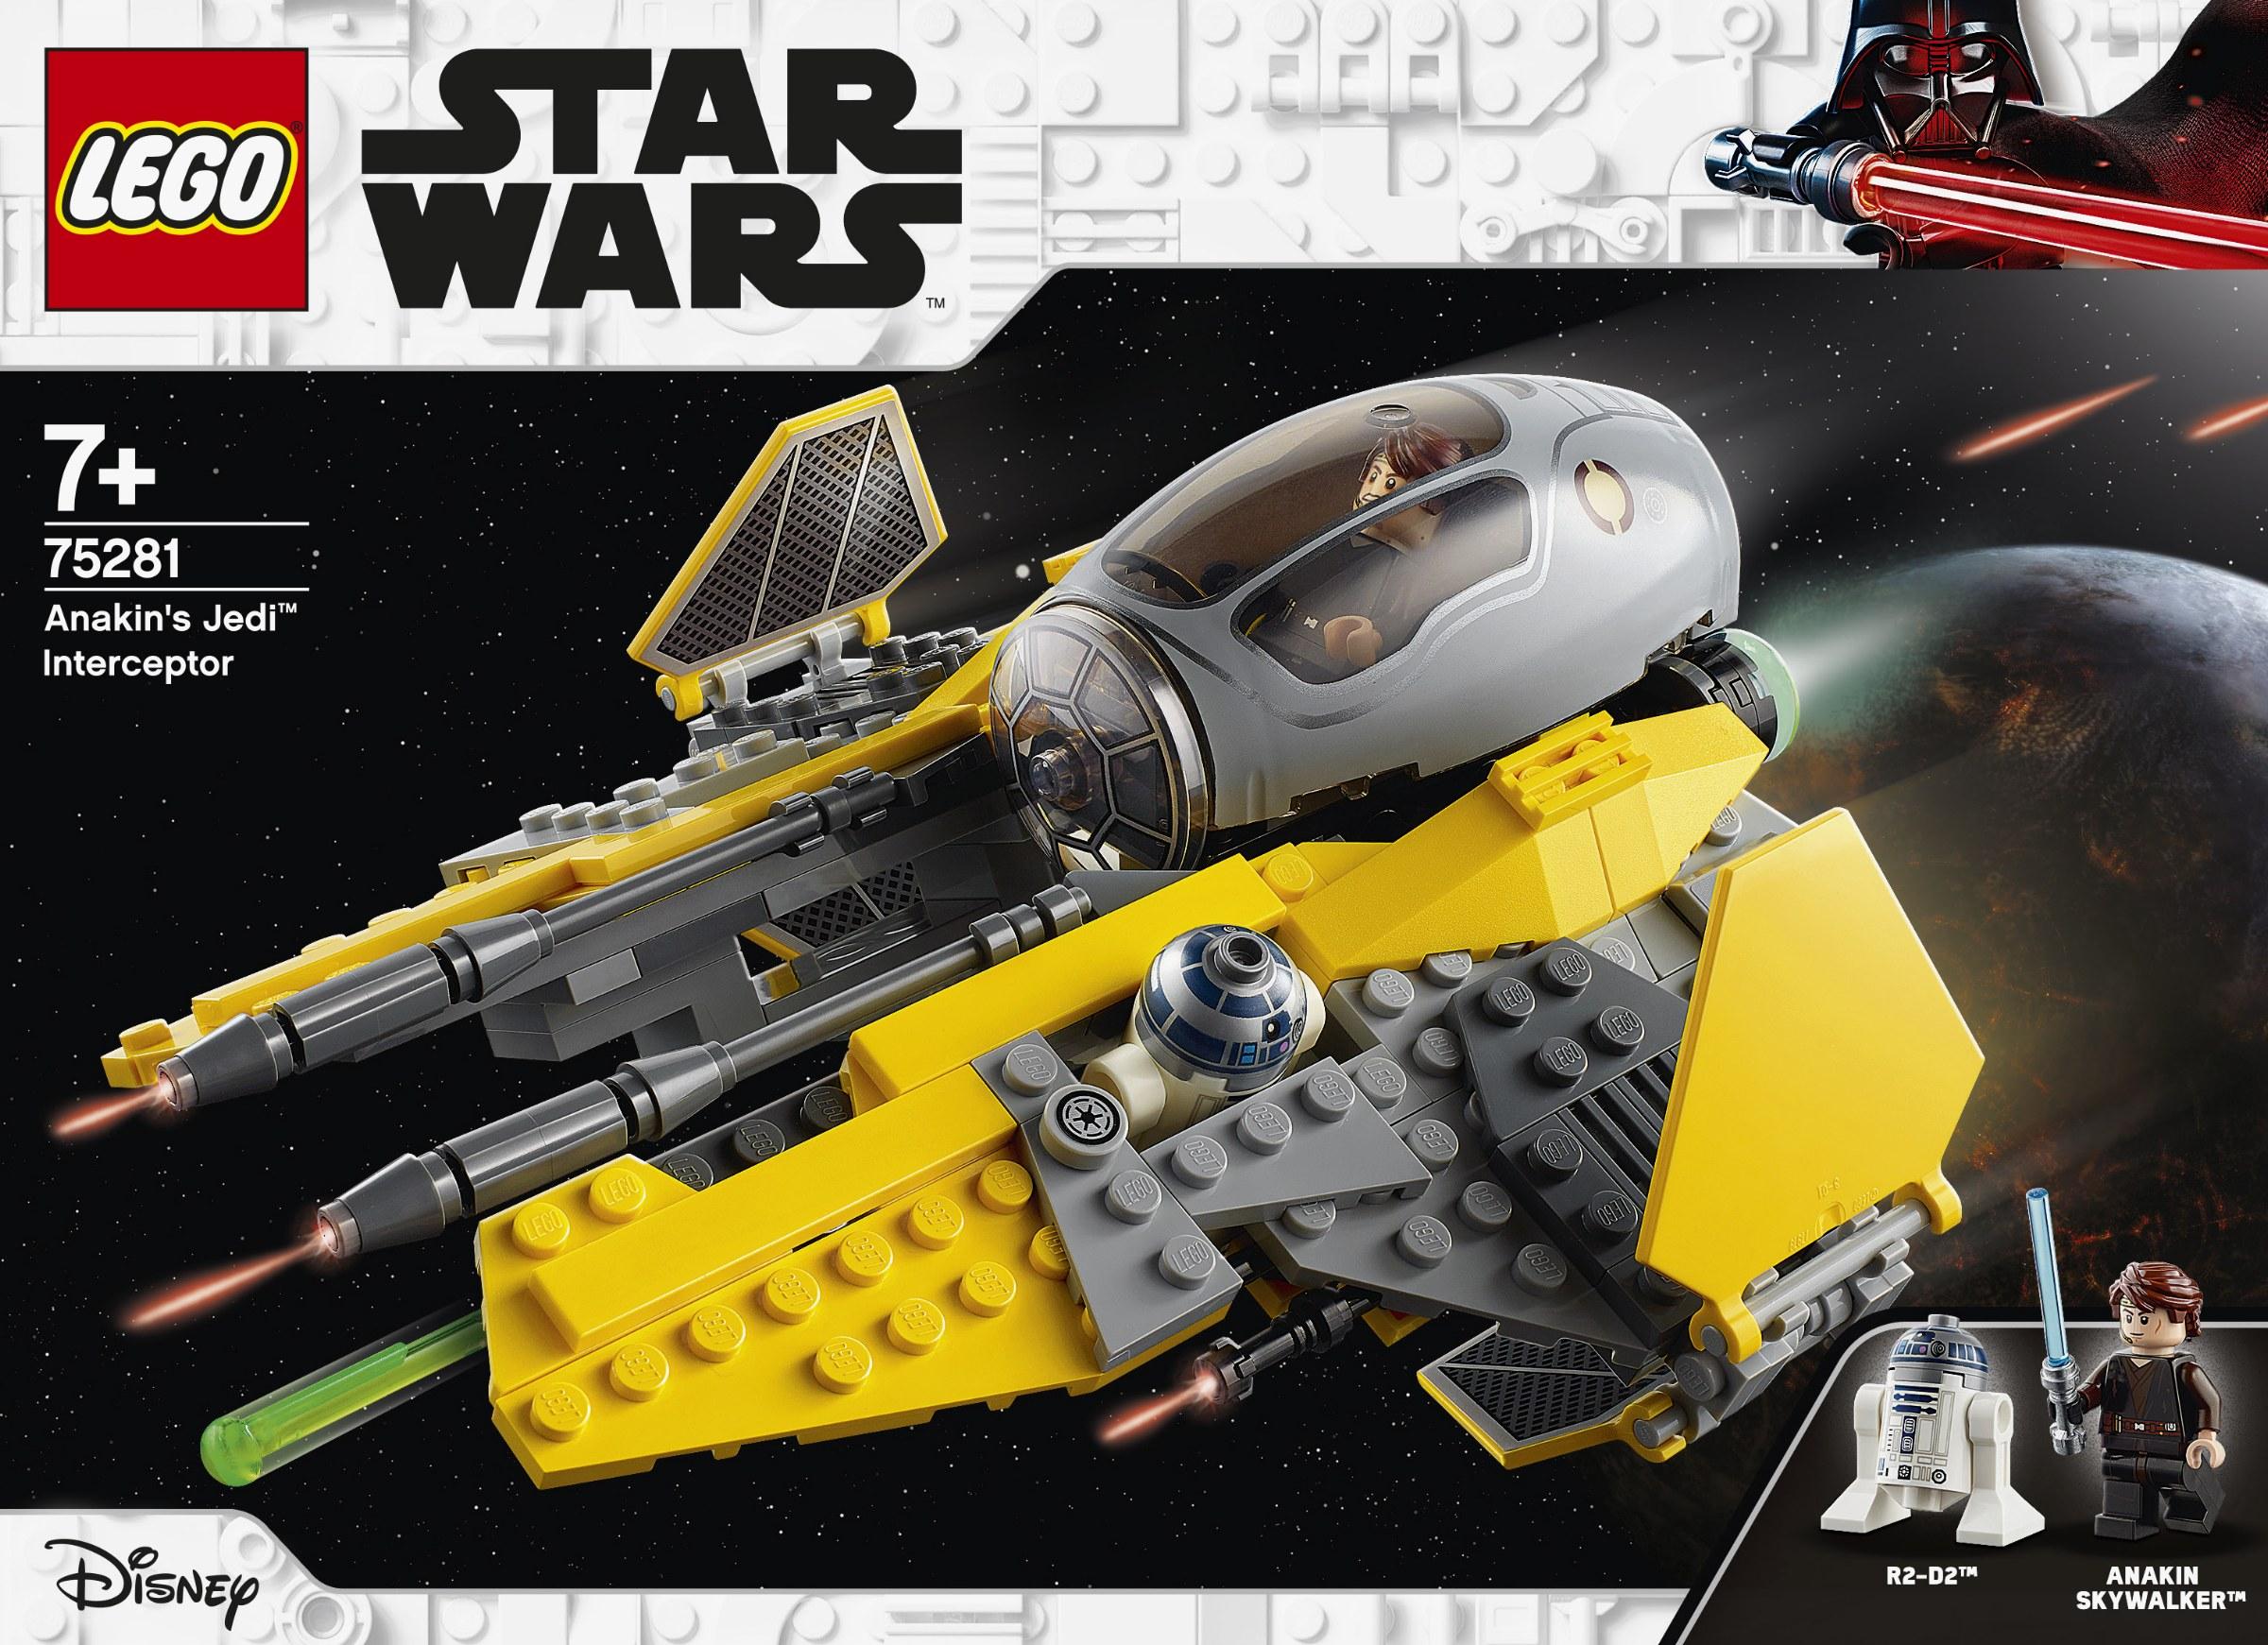 LEGO Star Wars - Anakin's Jedi Interceptor (75281)